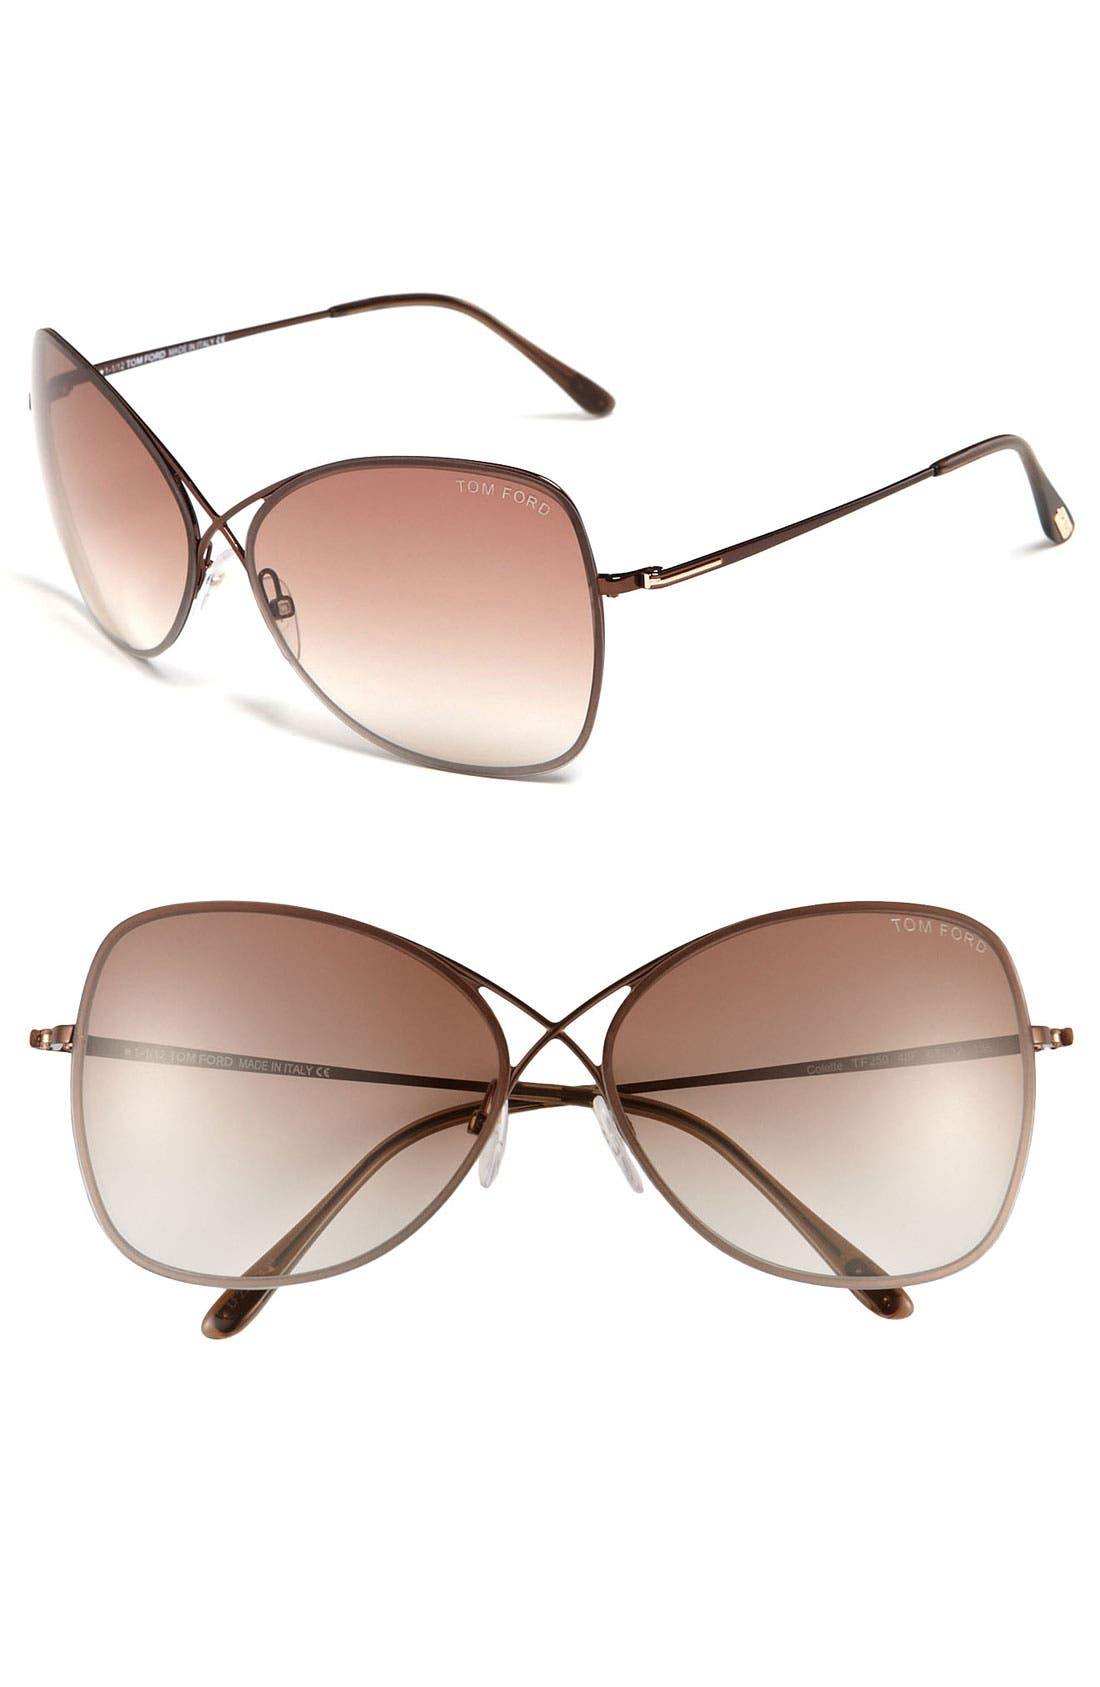 Alternate Image 1 Selected - Tom Ford 'Colette' 63mm Oversized Sunglasses